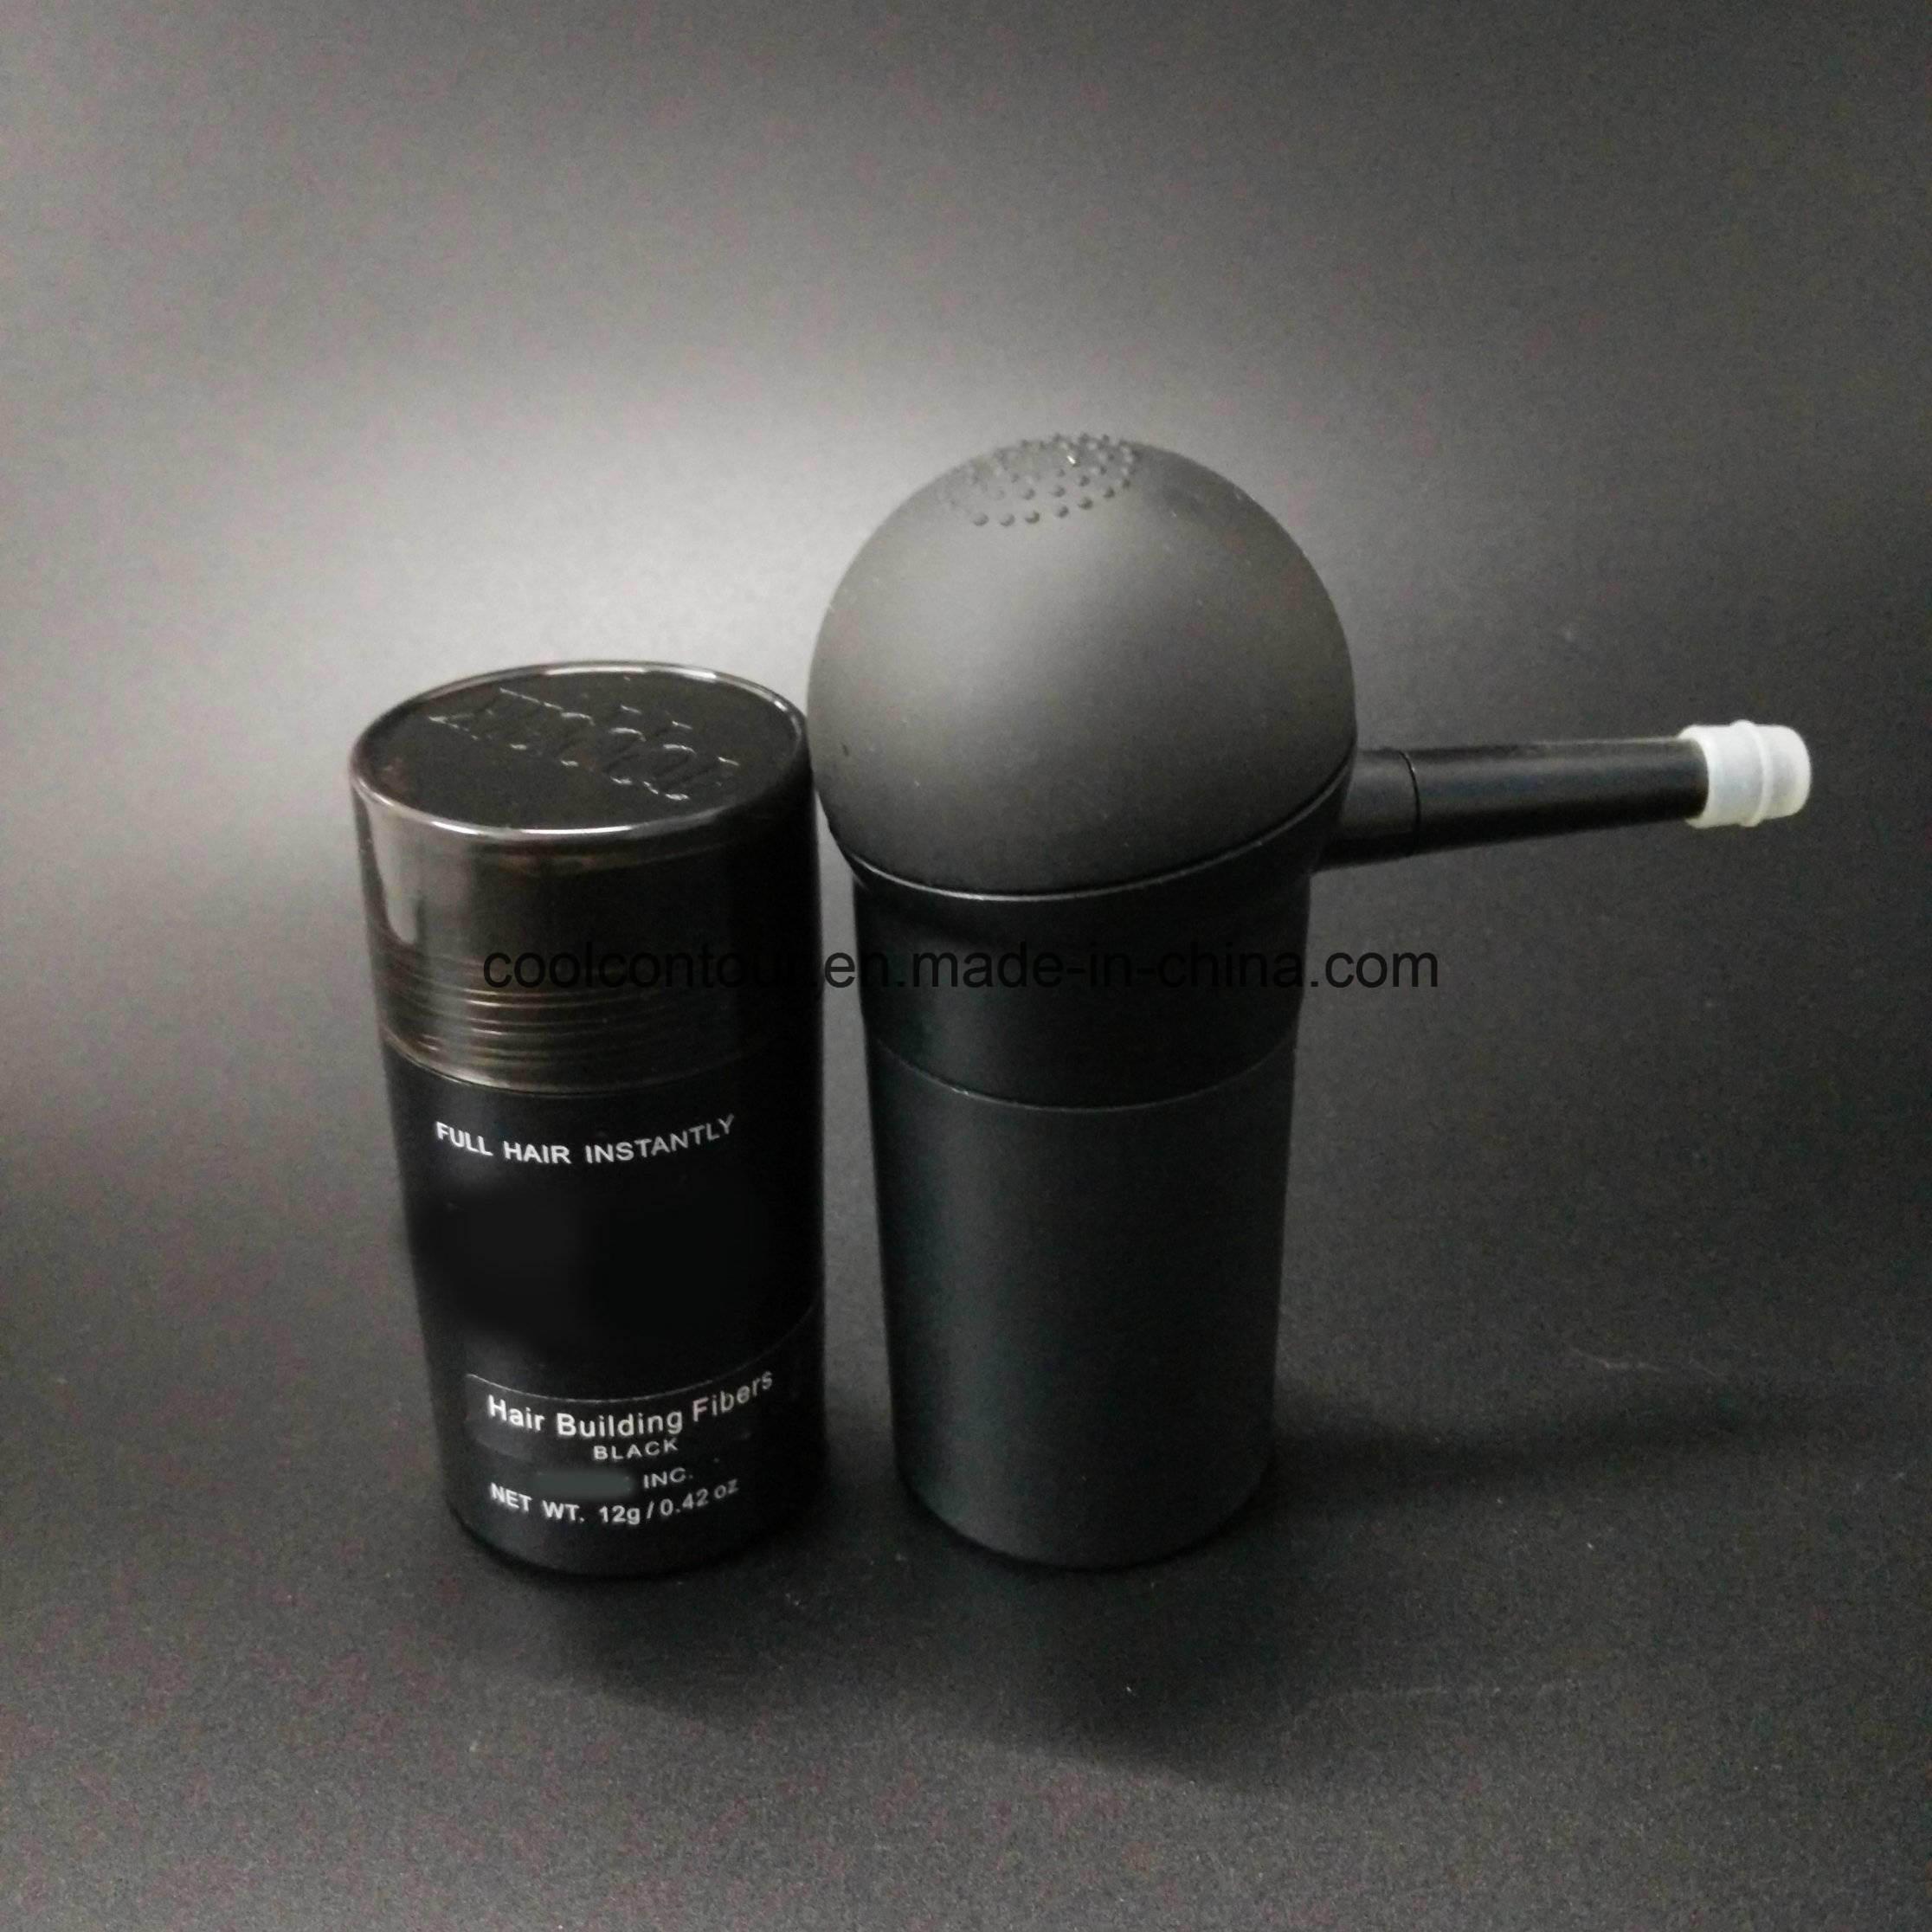 Factory Price High Quality Keratin Hair Building Fibers Powder Spray